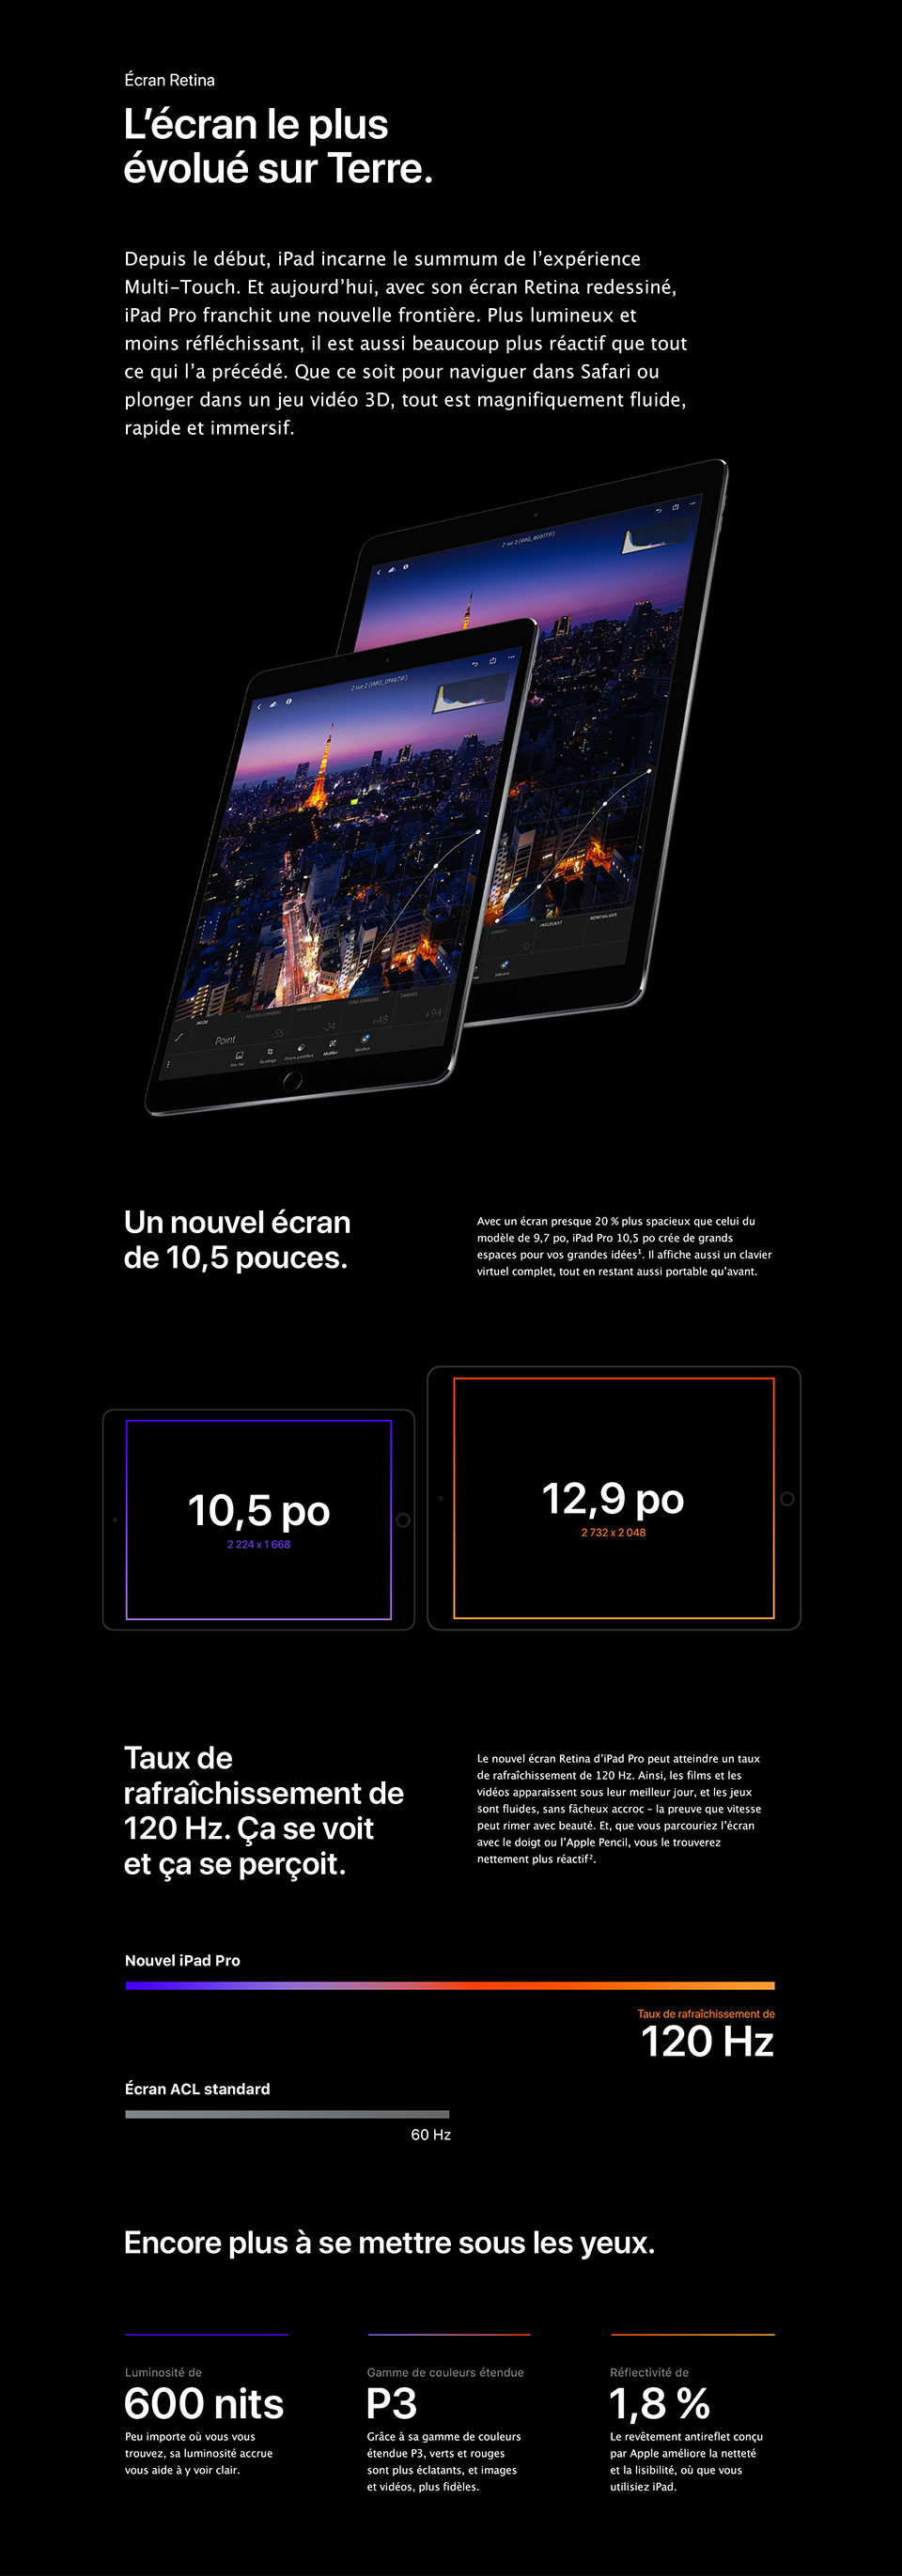 iPad Pro 12.9-inch. iPad Pro 9.7-inch